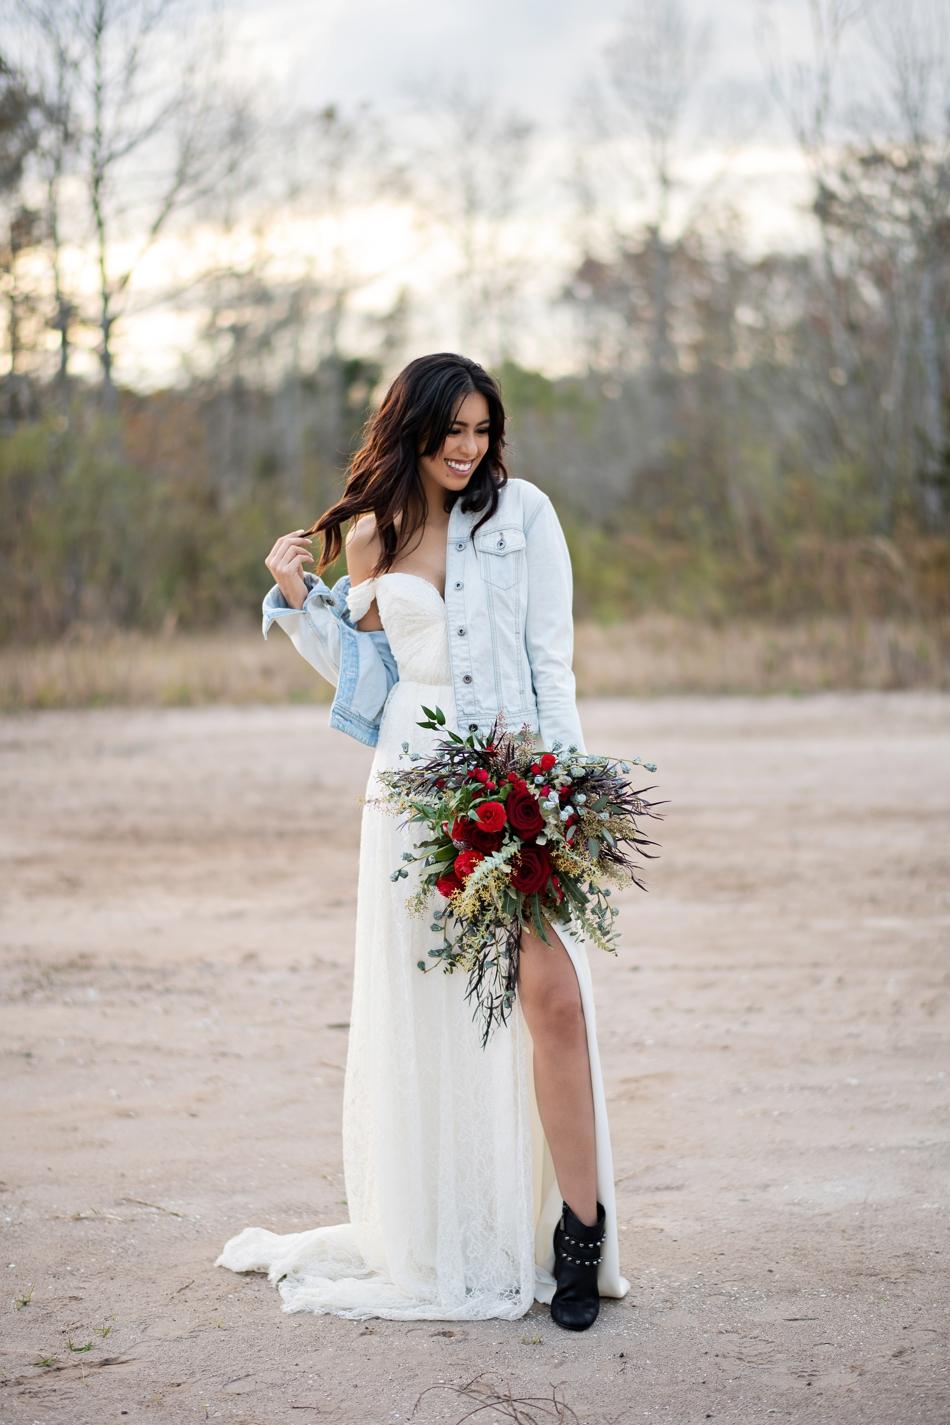 Black wedding shoes, winter bridal editorial